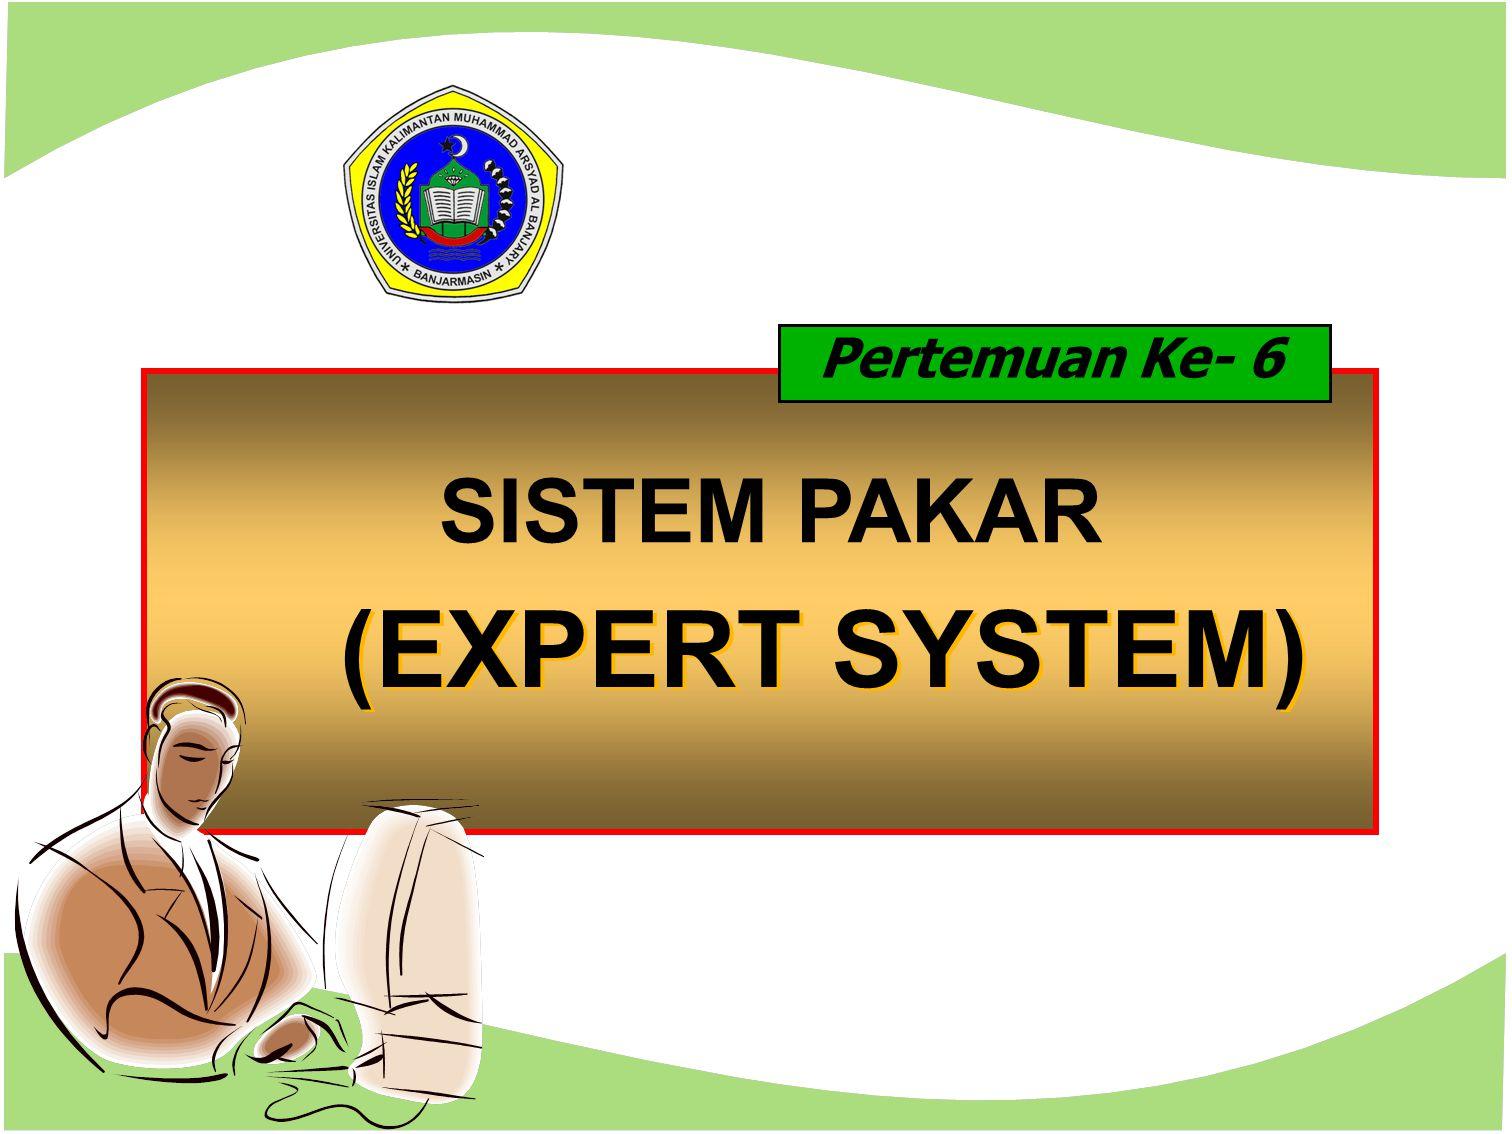 Pertemuan Ke- 6 SISTEM PAKAR (EXPERT SYSTEM)